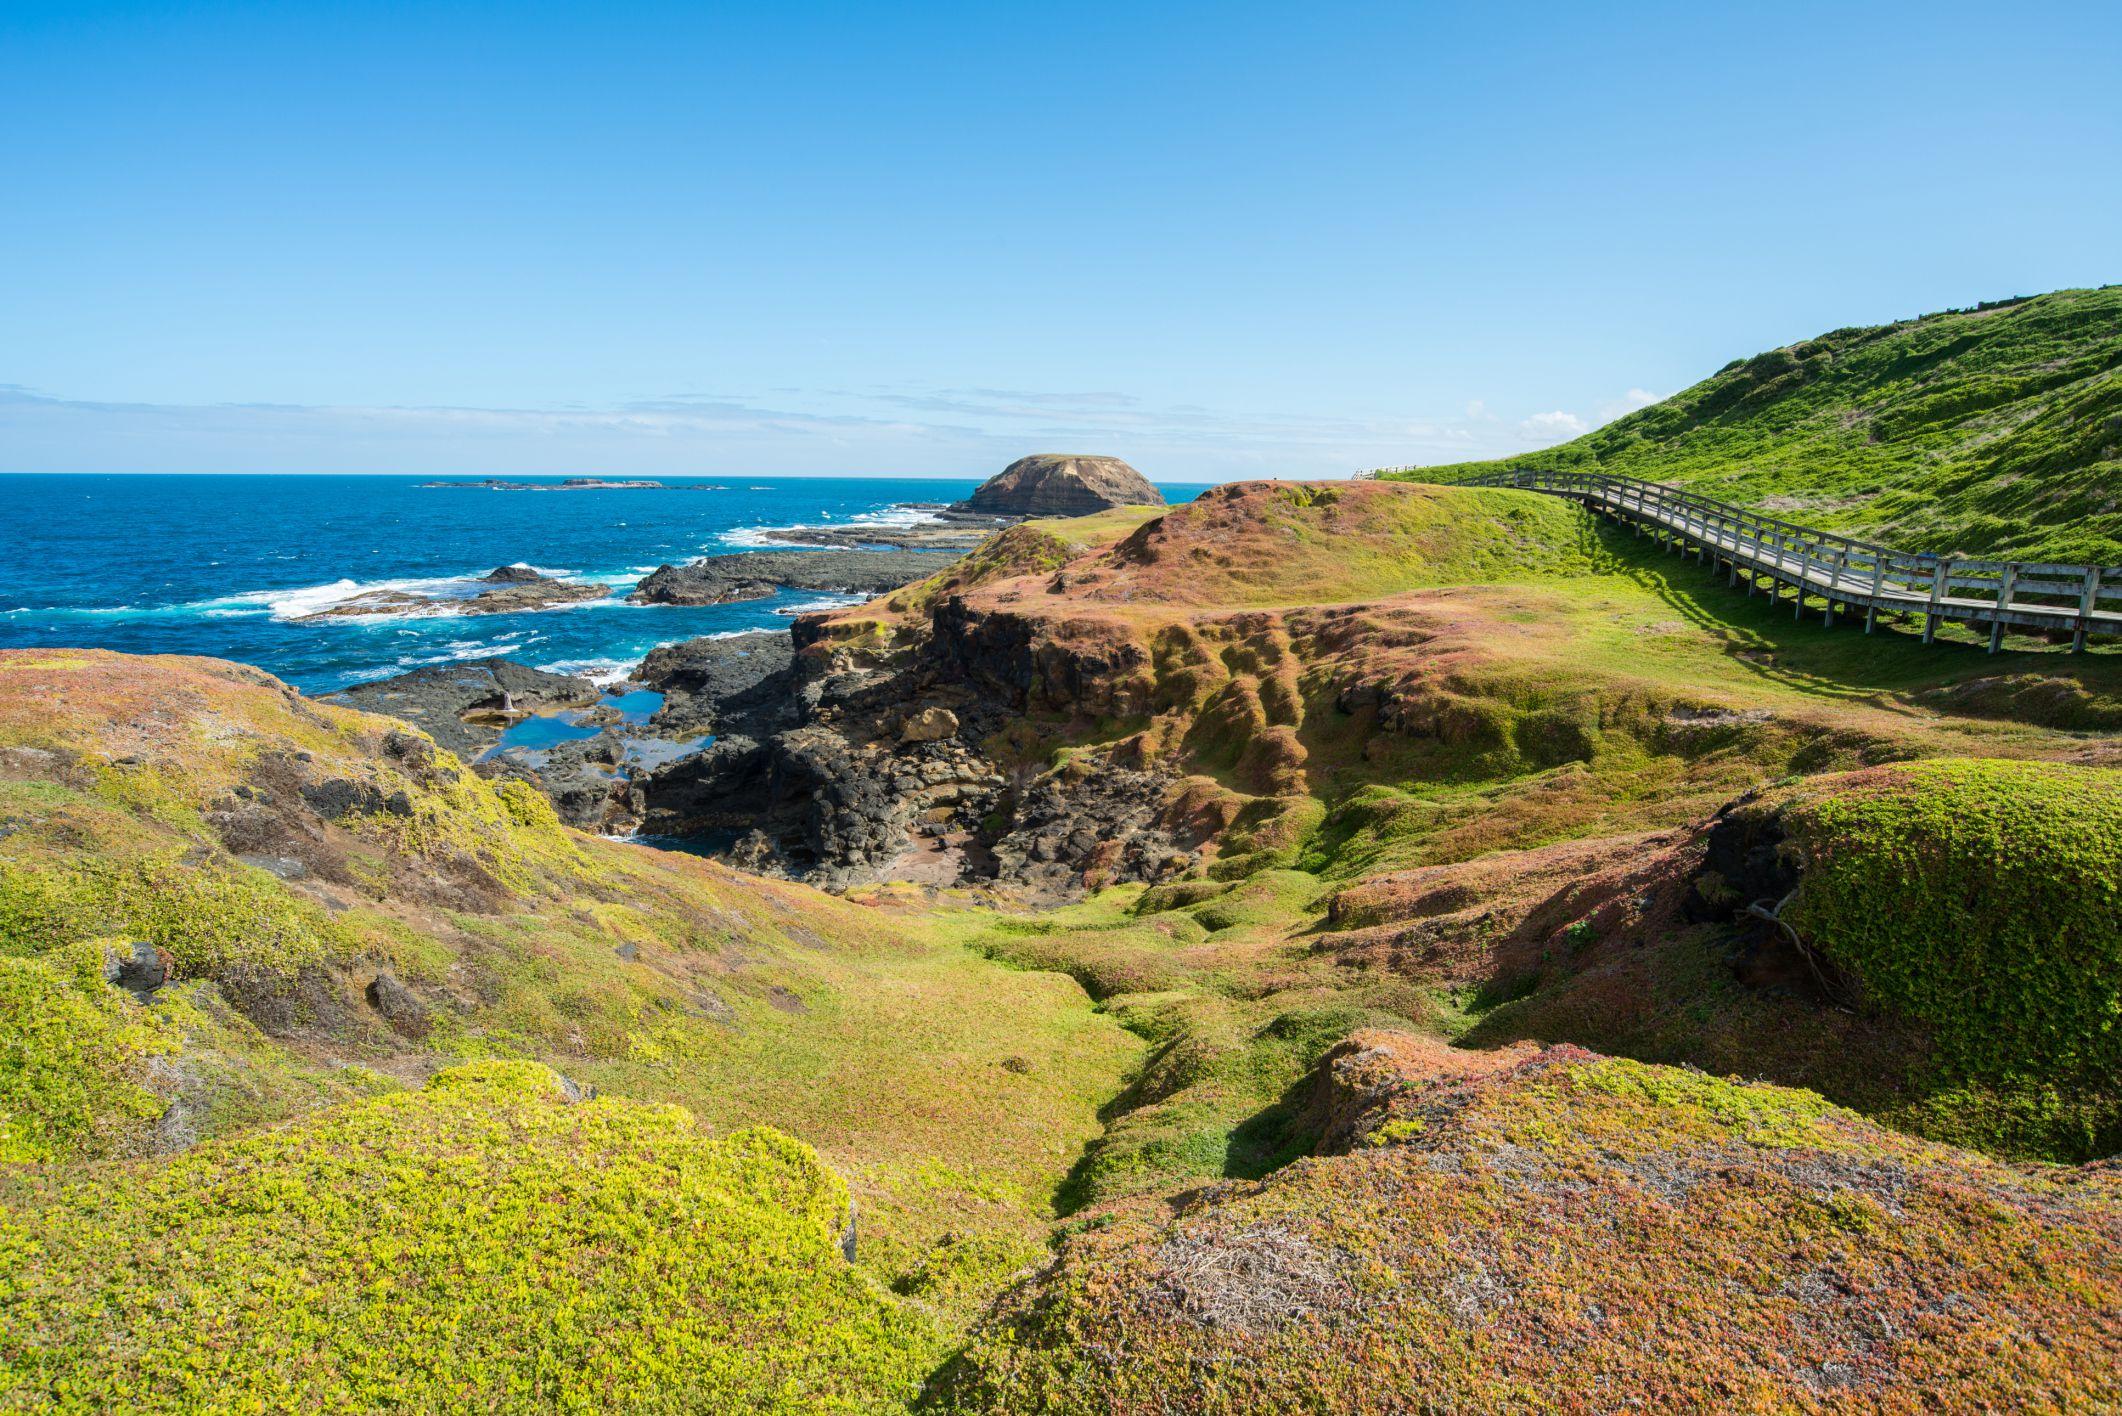 The Nobbies landscape of Phillip Island, Australia.